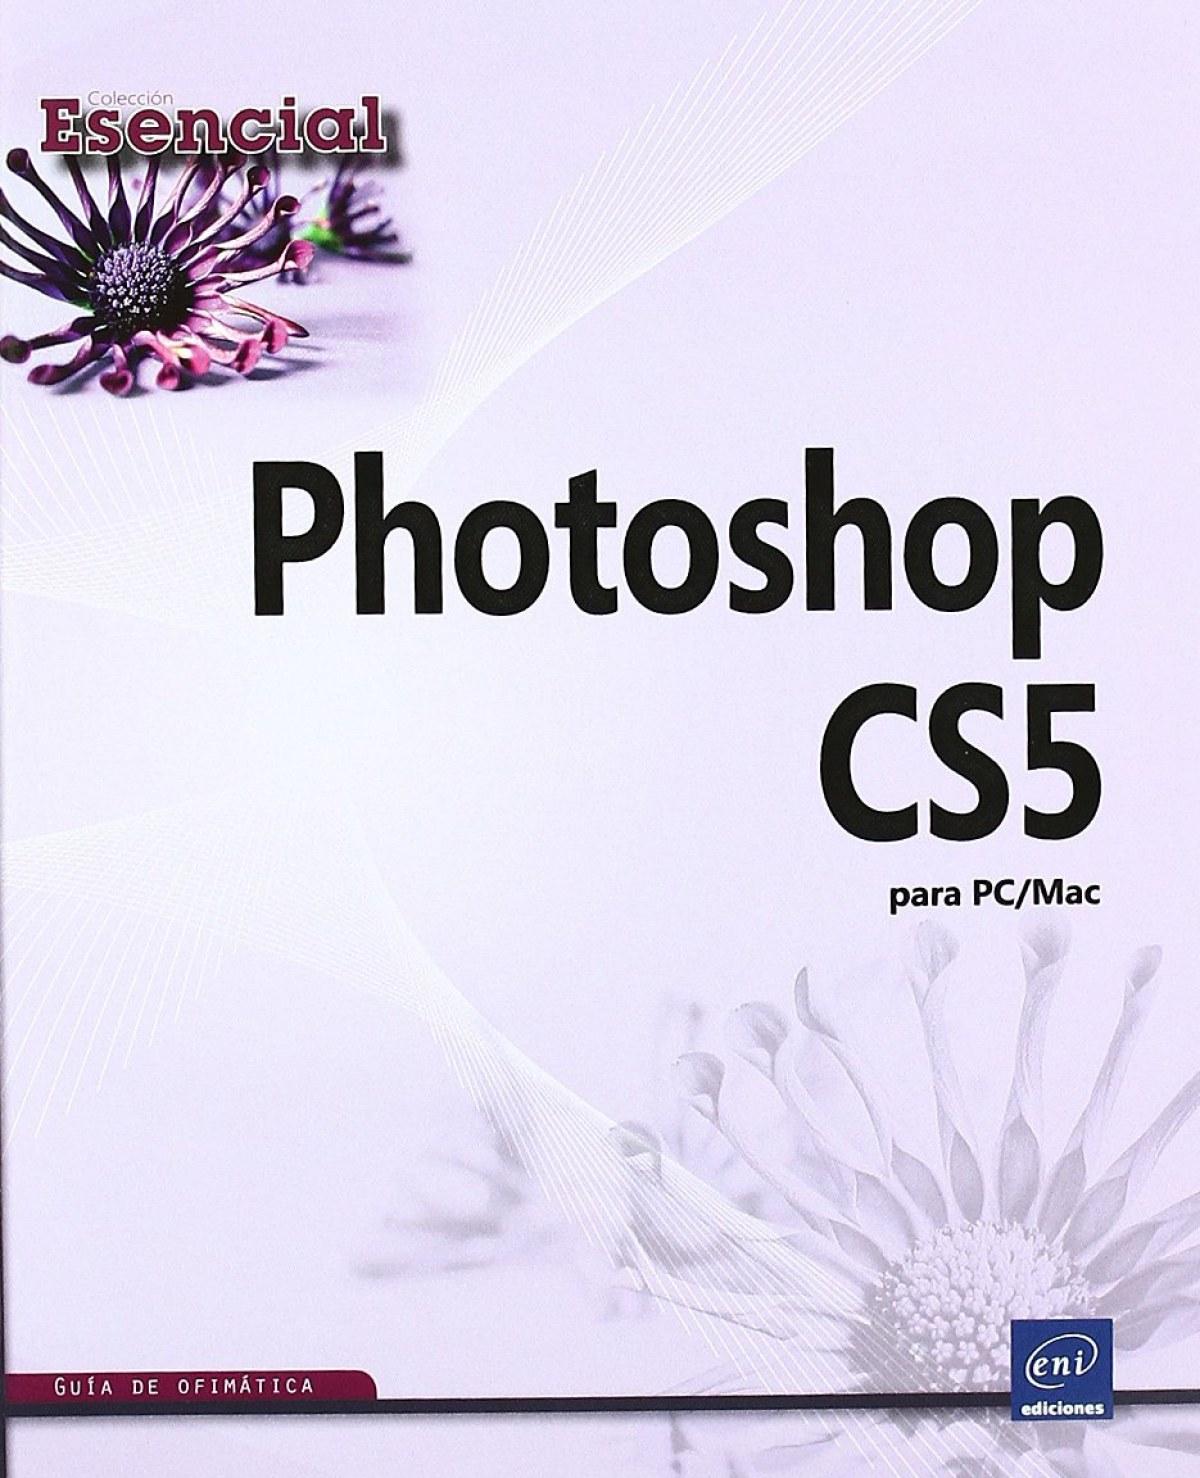 Esencial Photoshop CS5 para PC/Mac